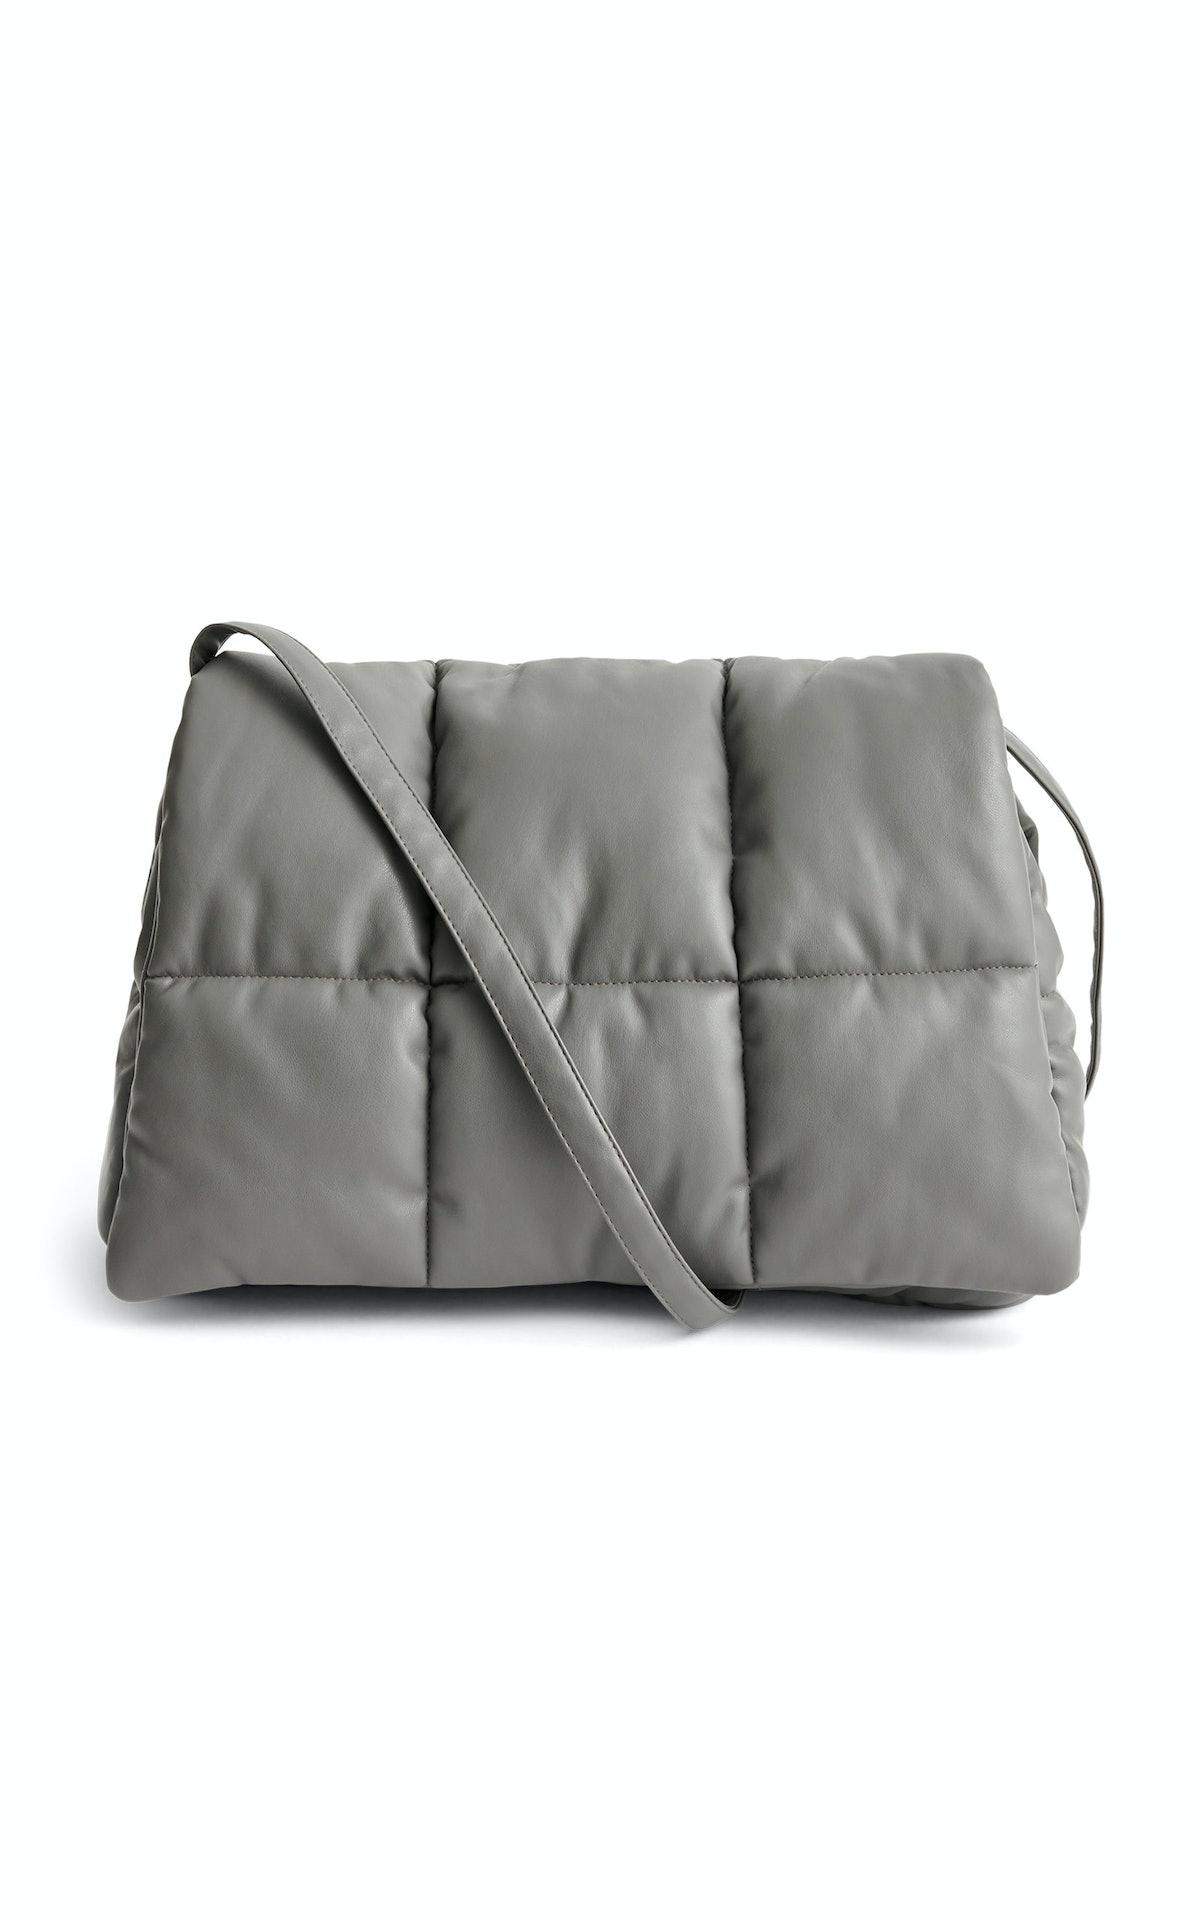 Wanda Oversized Leather Clutch